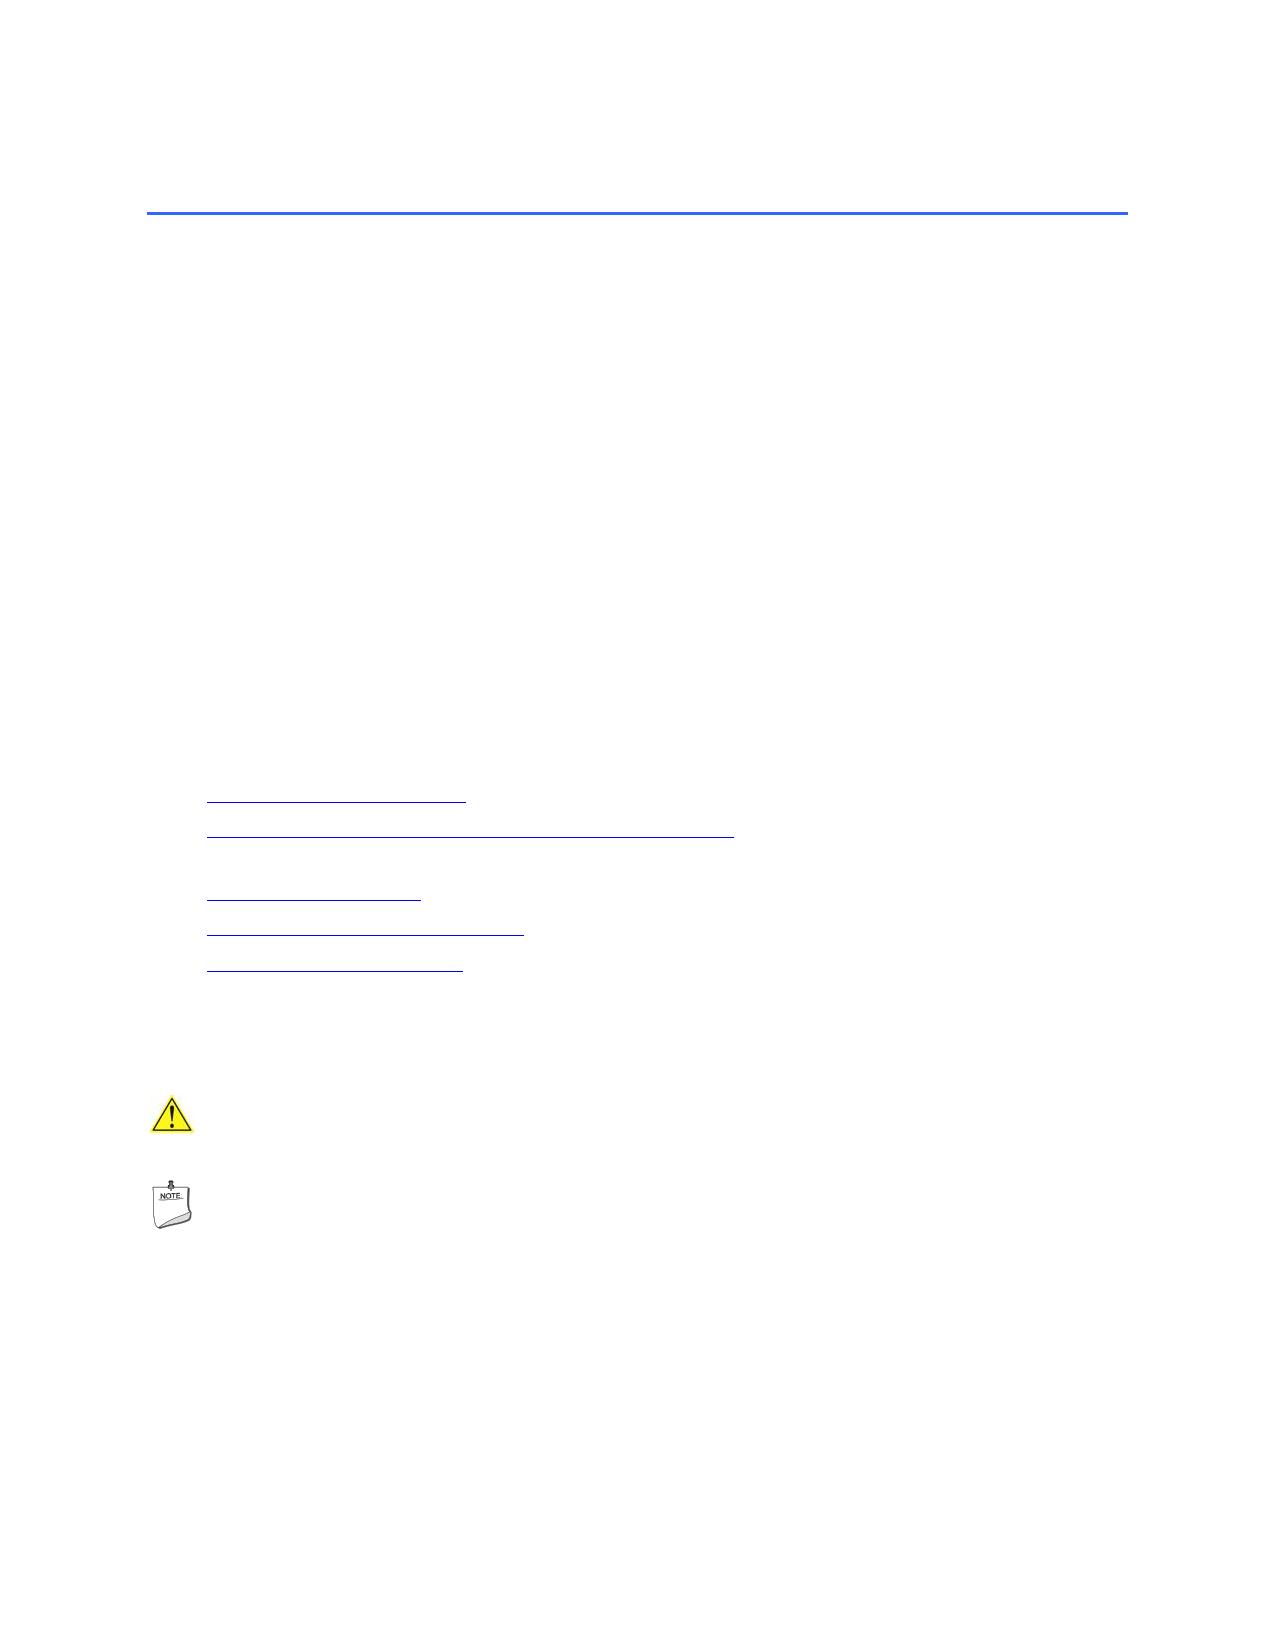 D102GGC2 pdf, ピン配列